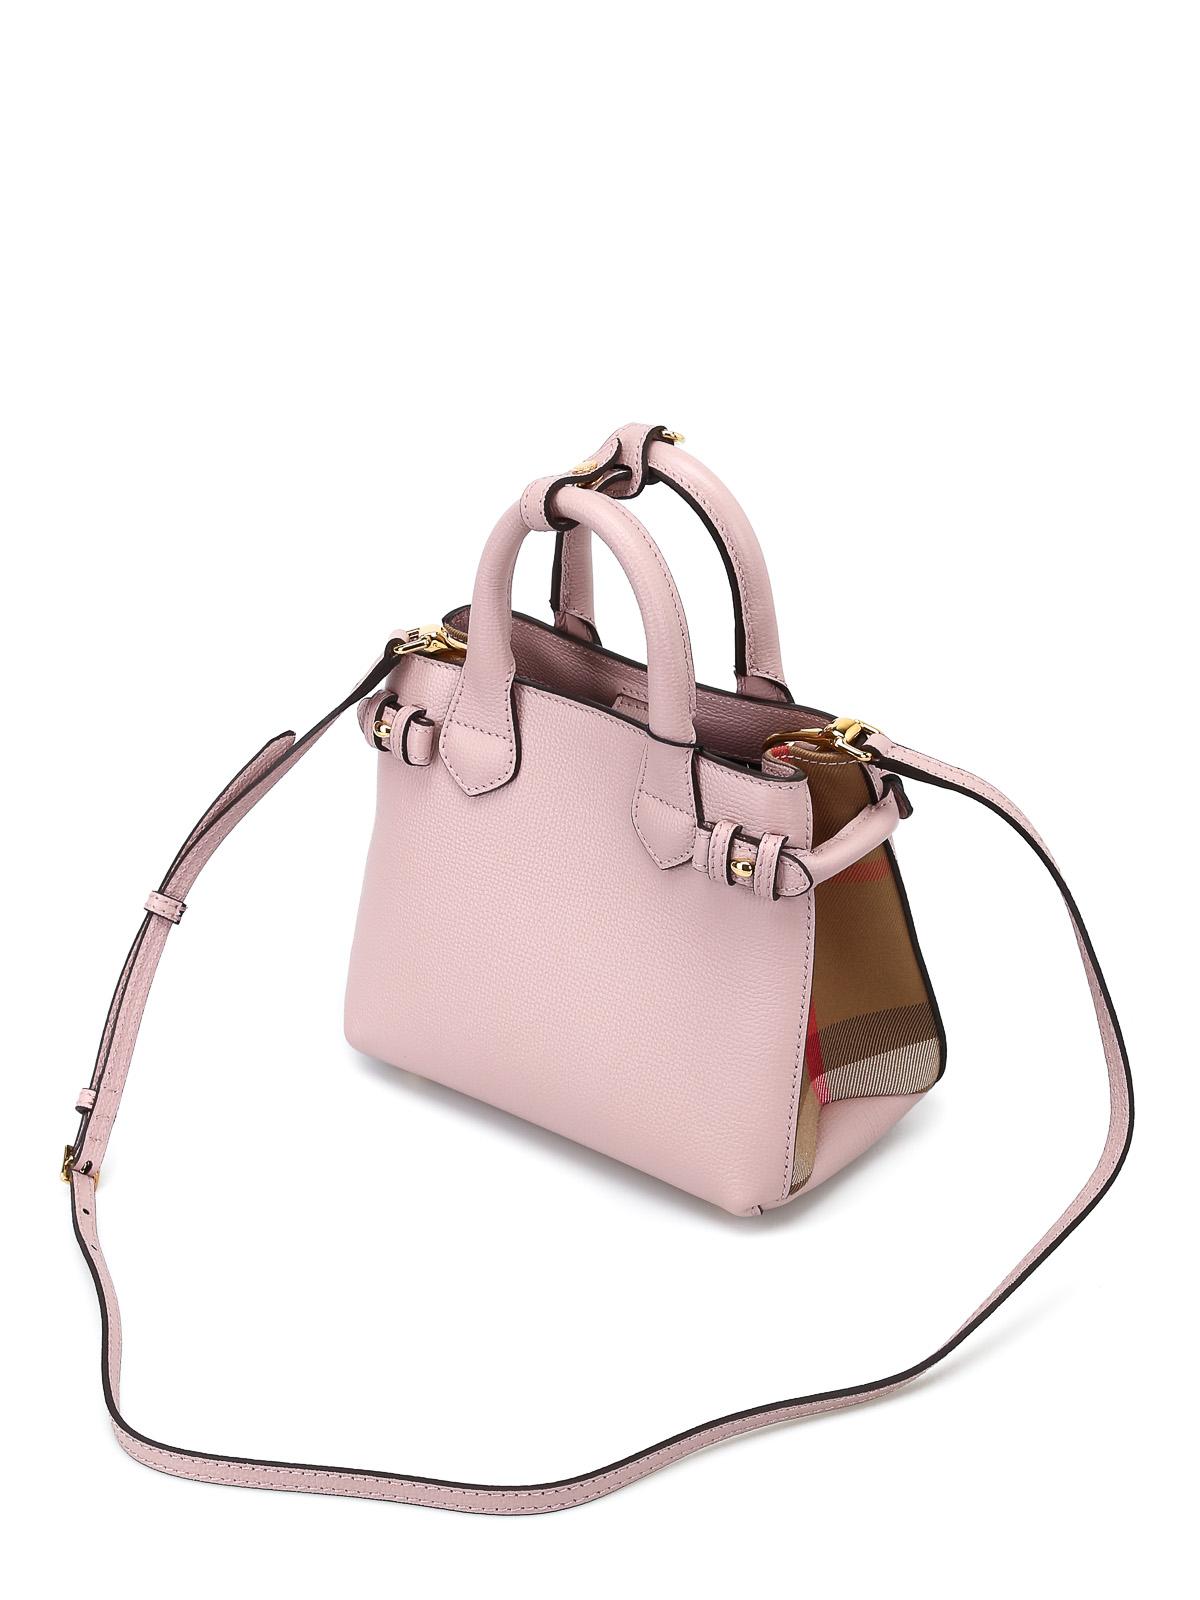 6921b27978b9 Burberry - The Baby Banner pink mini handbag - totes bags - 4023713